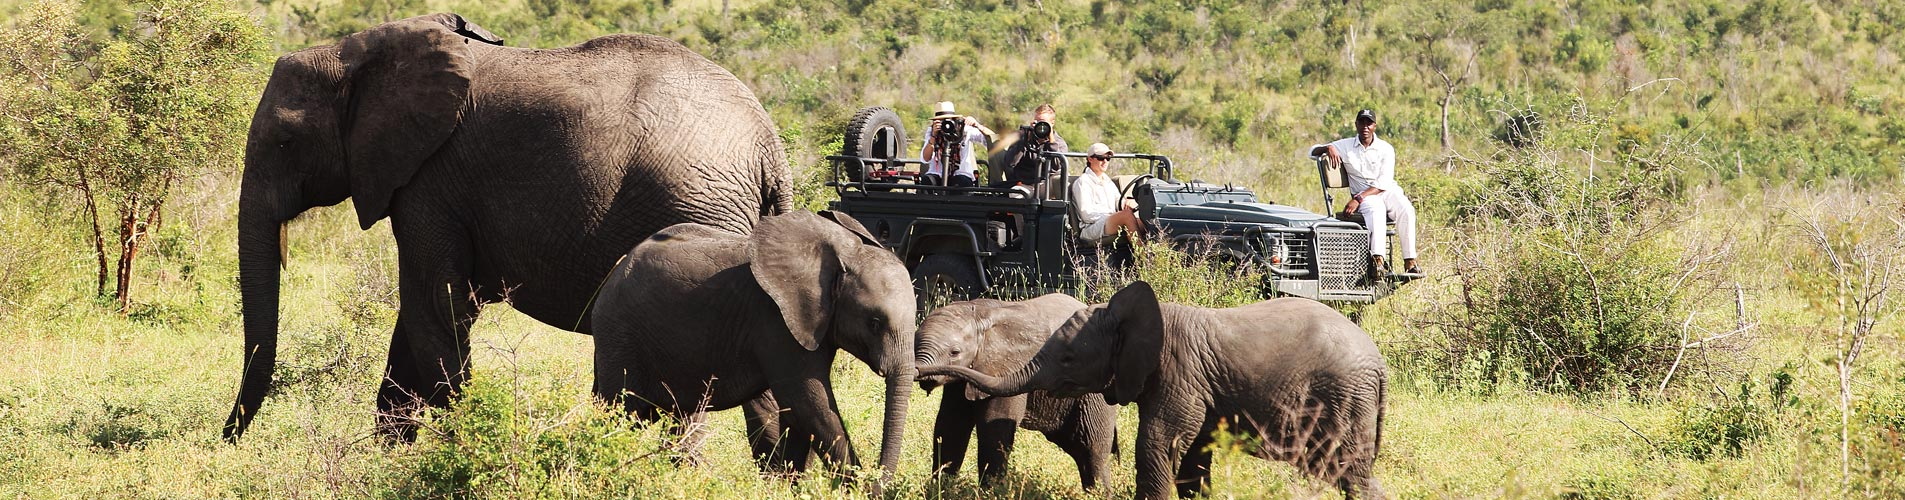 Custom Photographic Safari, Elephant Family